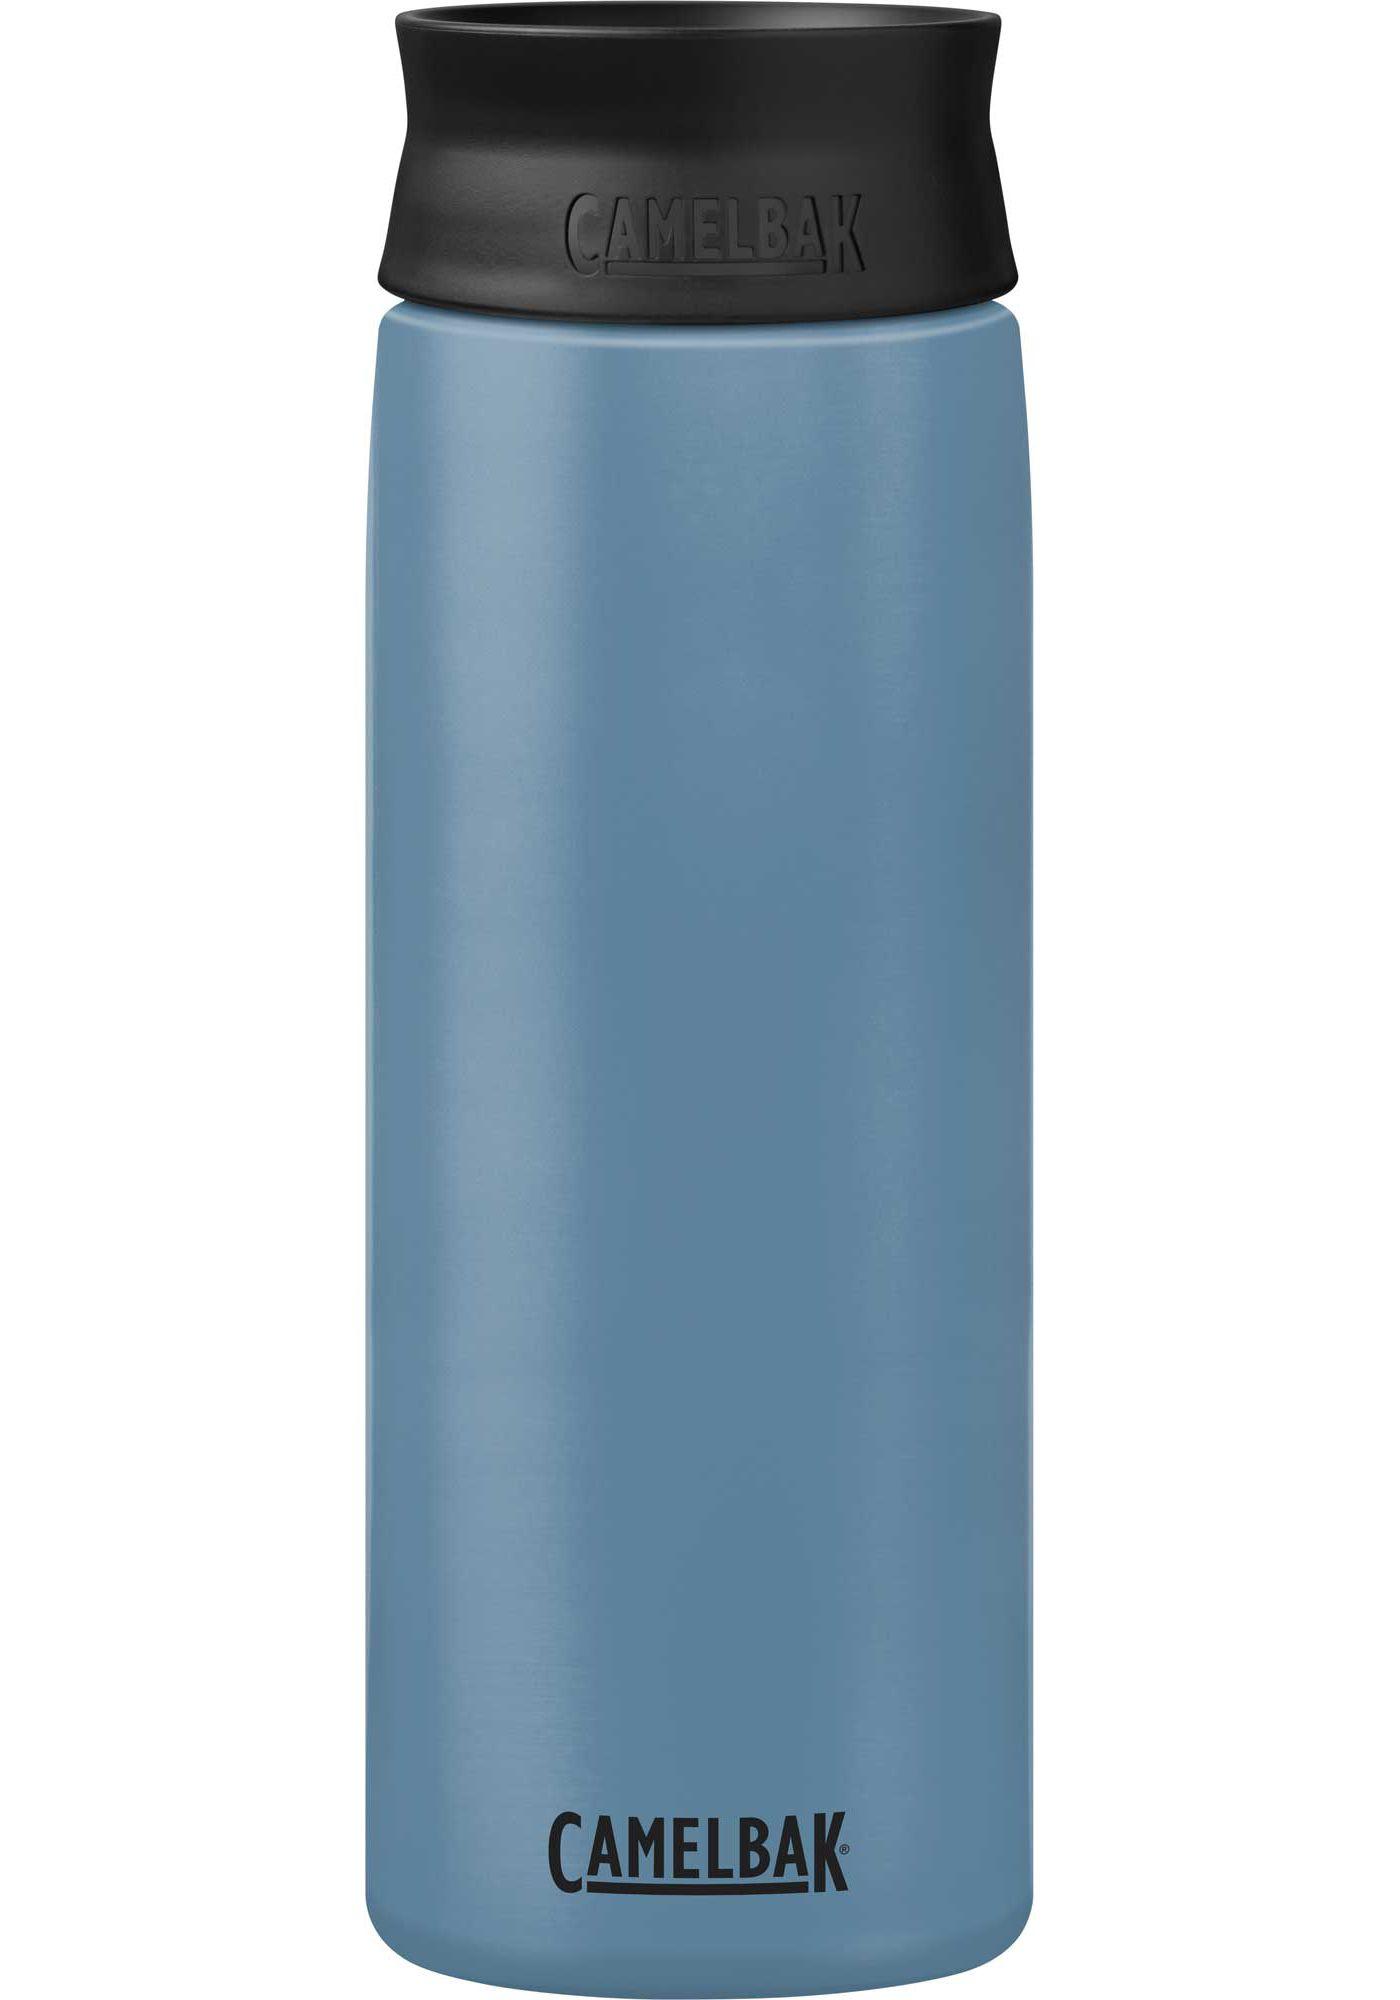 Camelbak Hot Cap 20 oz. Insulated Bottle